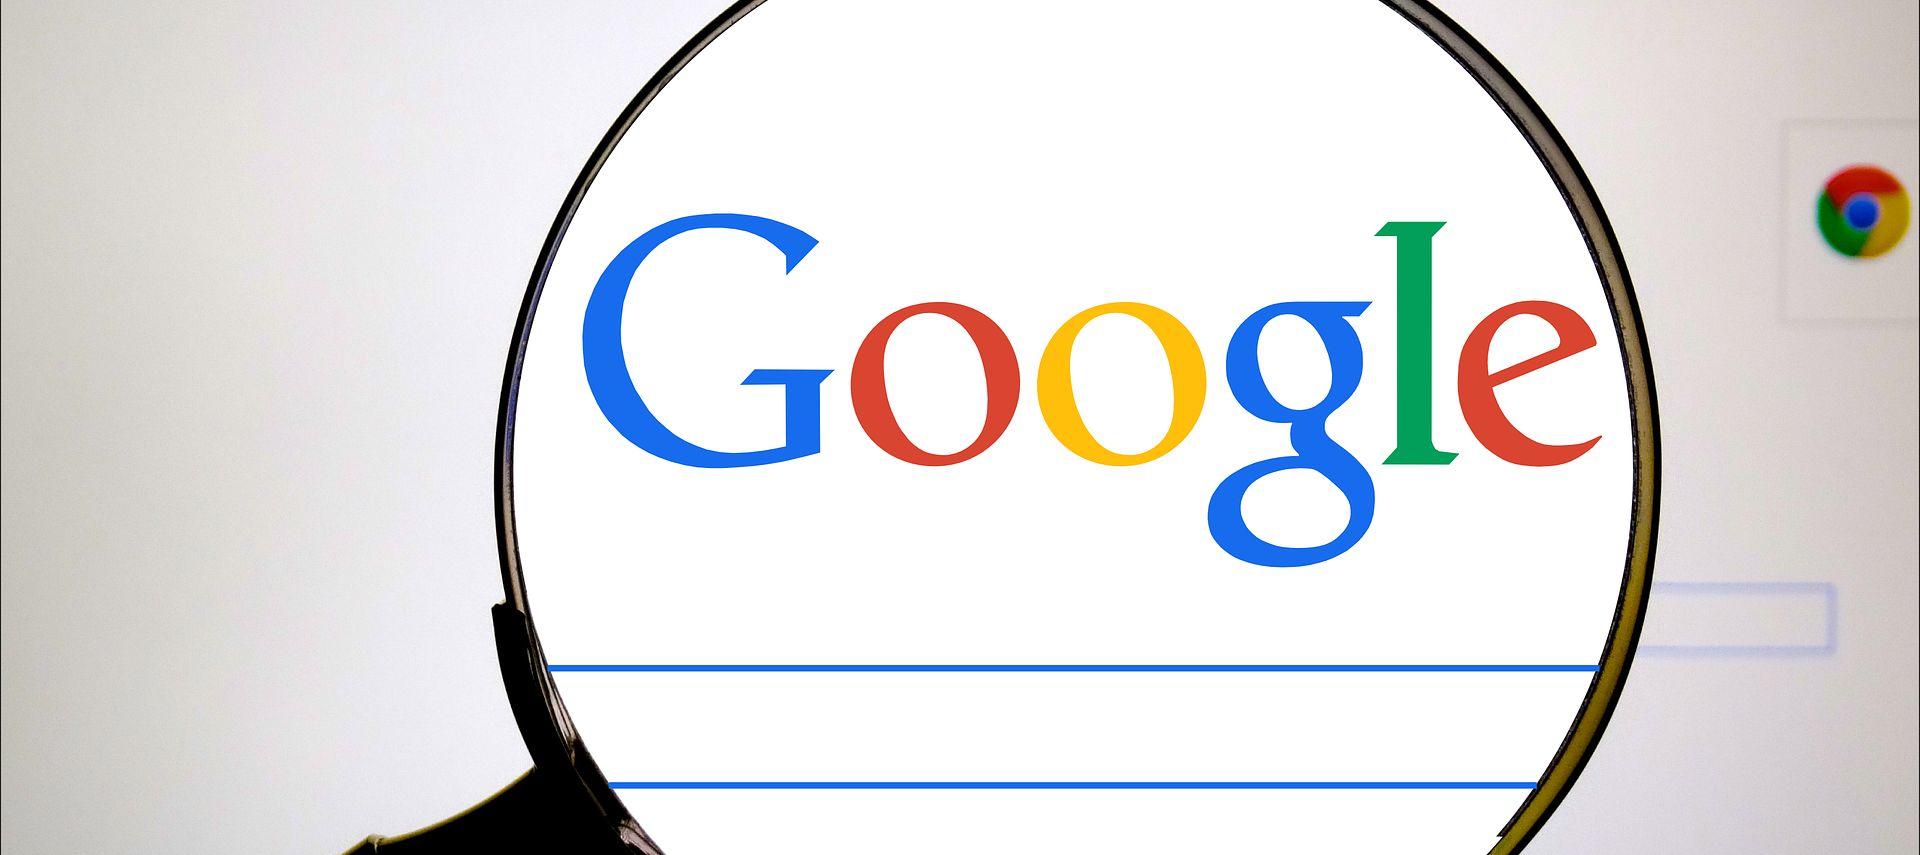 Google ne mora platiti 1,1 milijardu eura poreza Francuskoj